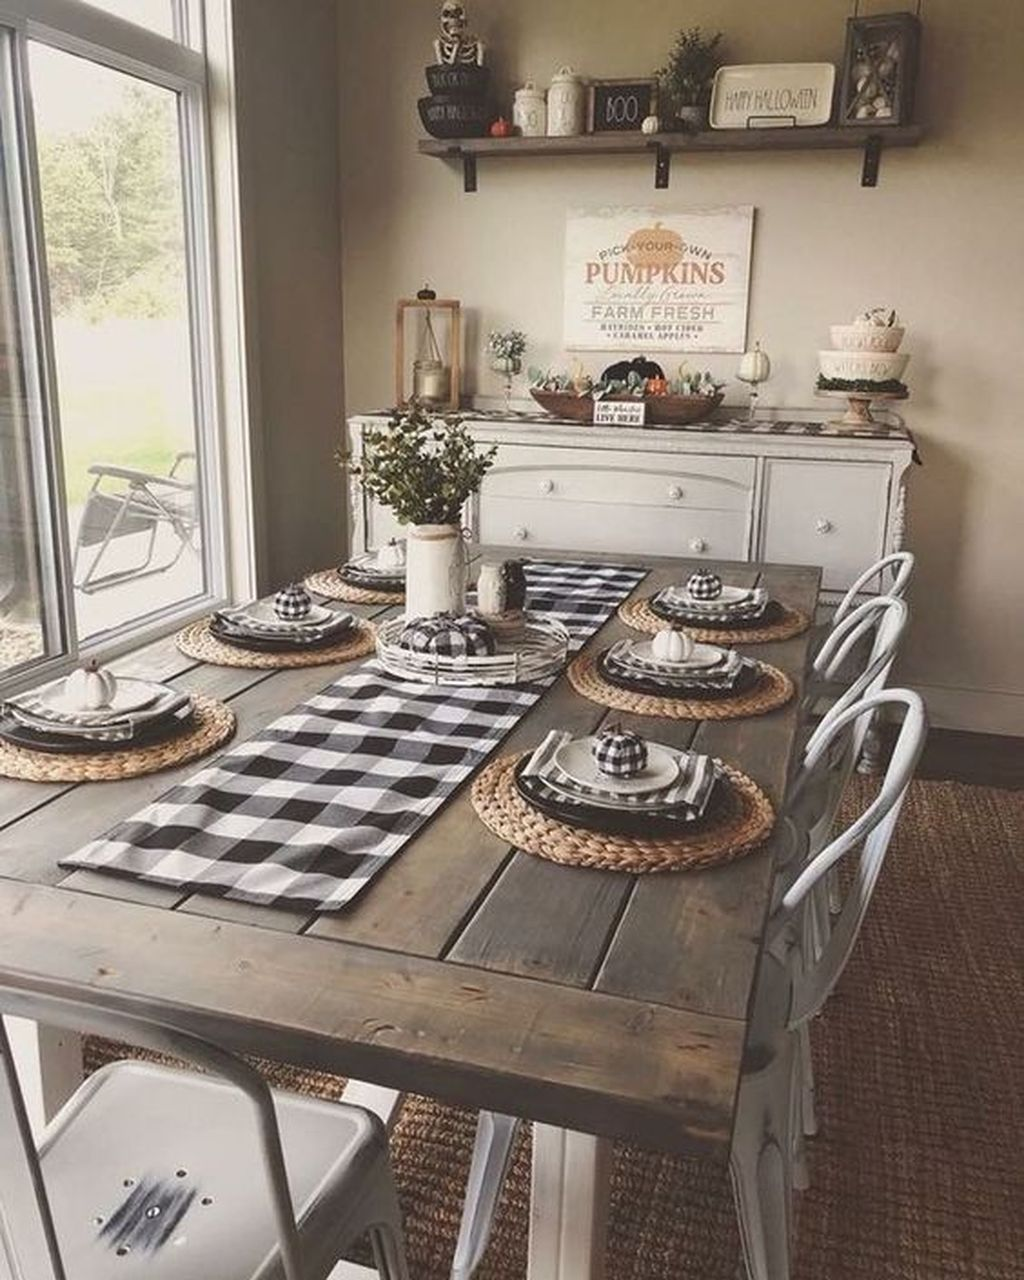 The Best Farmhouse Kitchen Decor Ideas 25